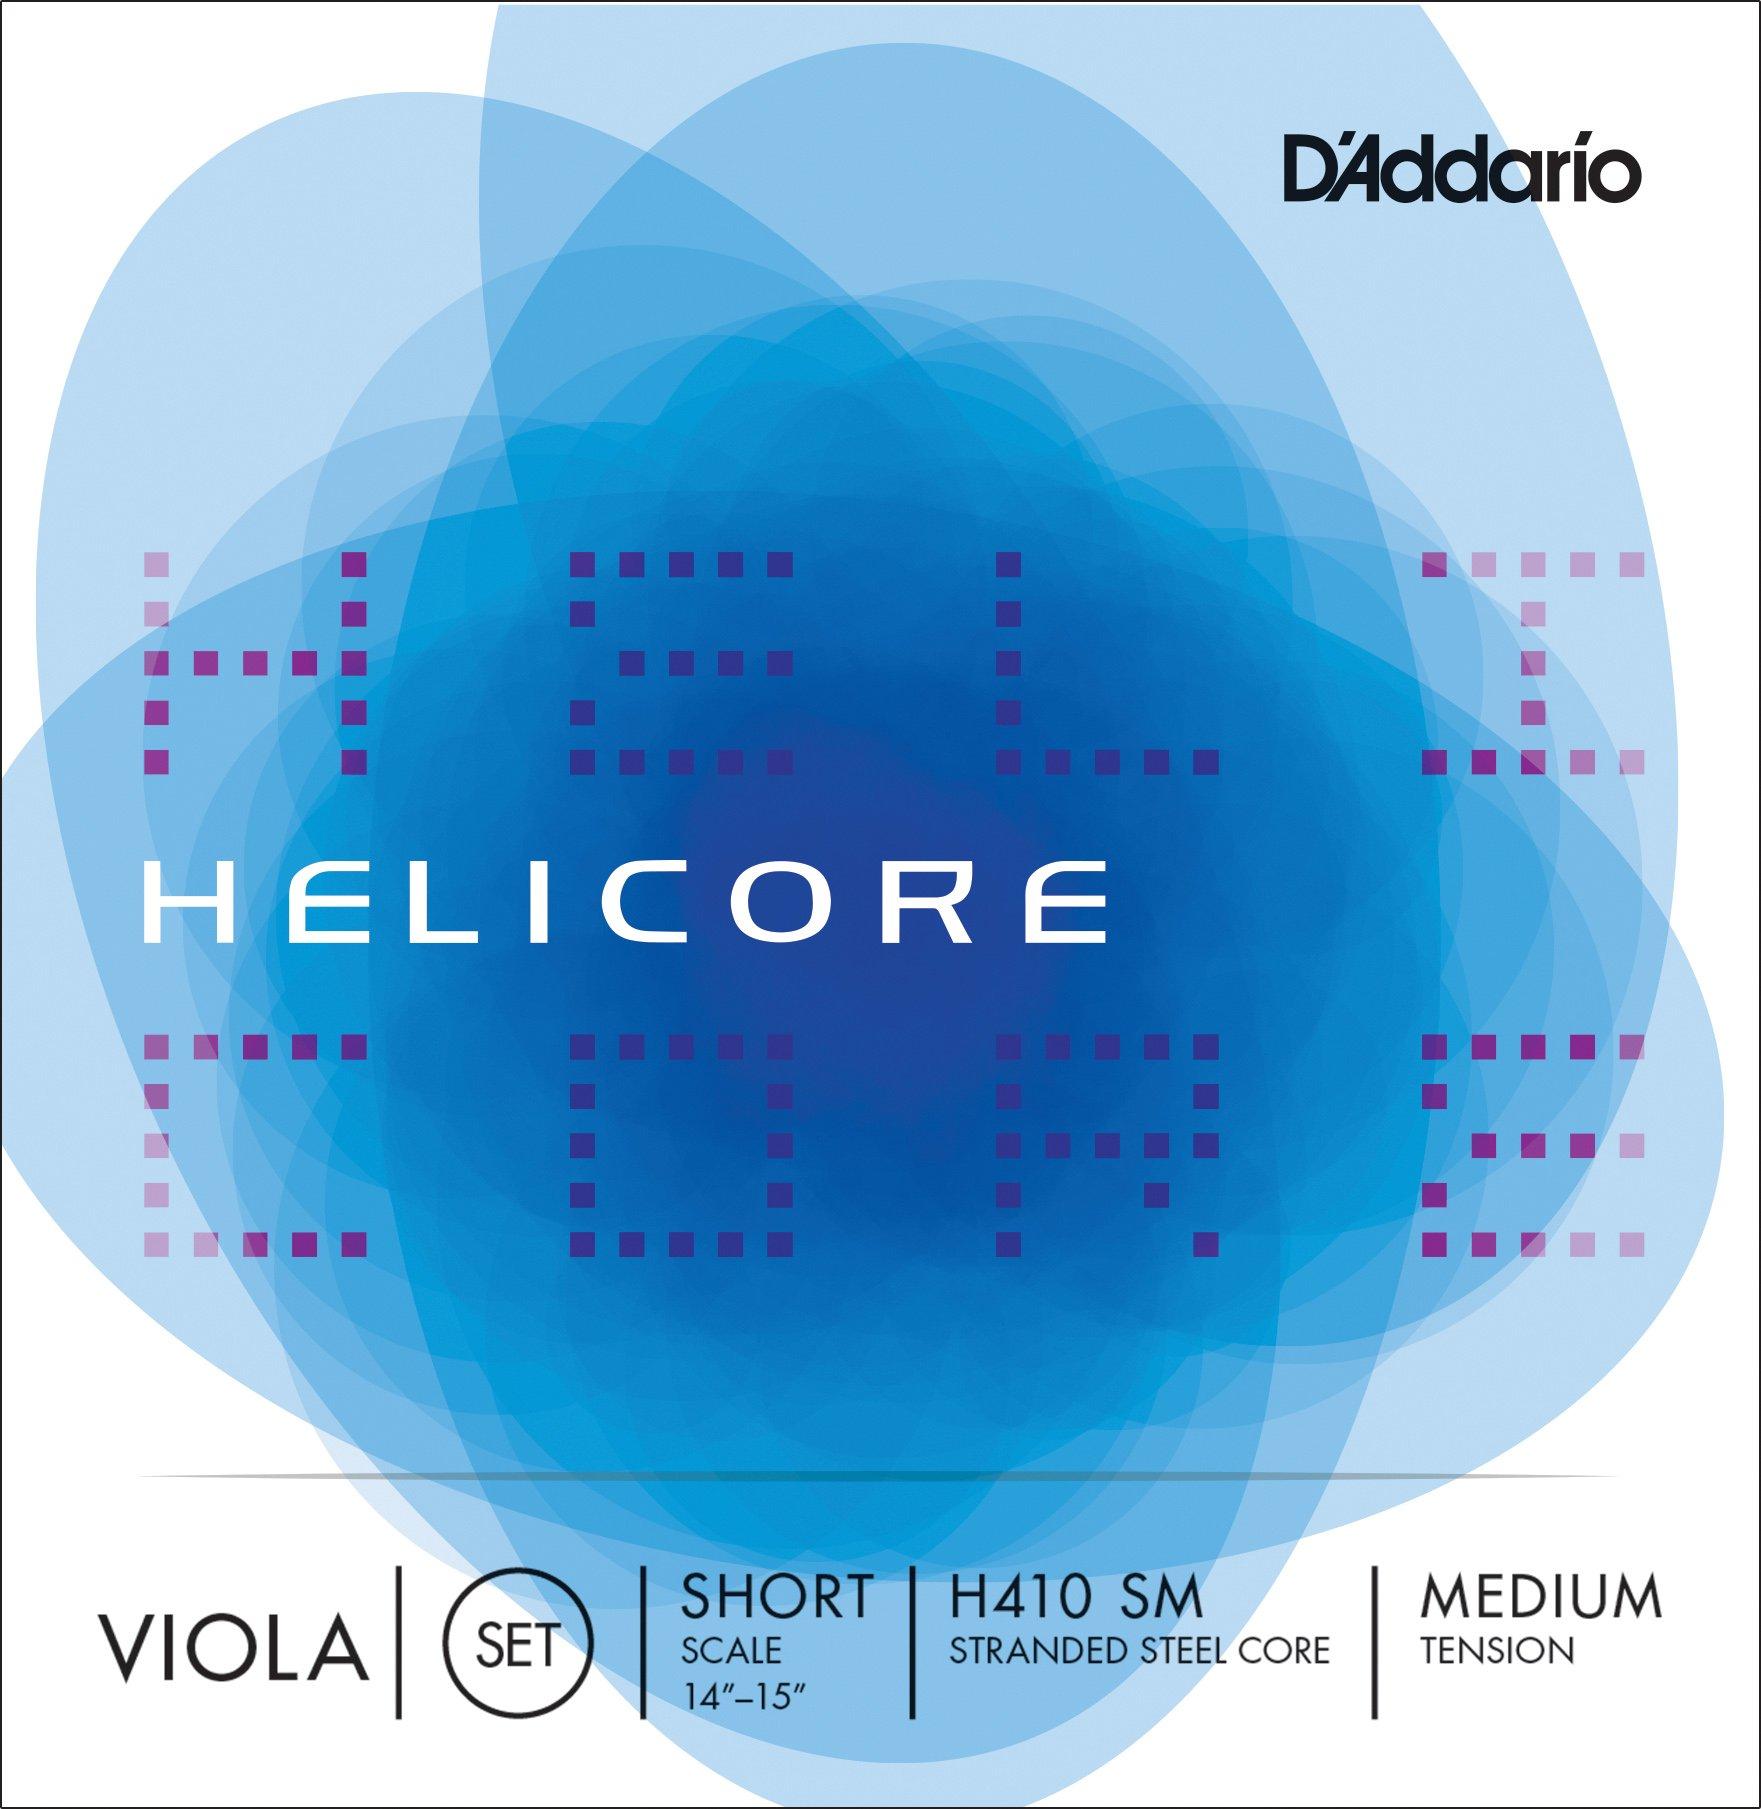 D'Addario Helicore Viola String Set, Short Scale, Medium Tension